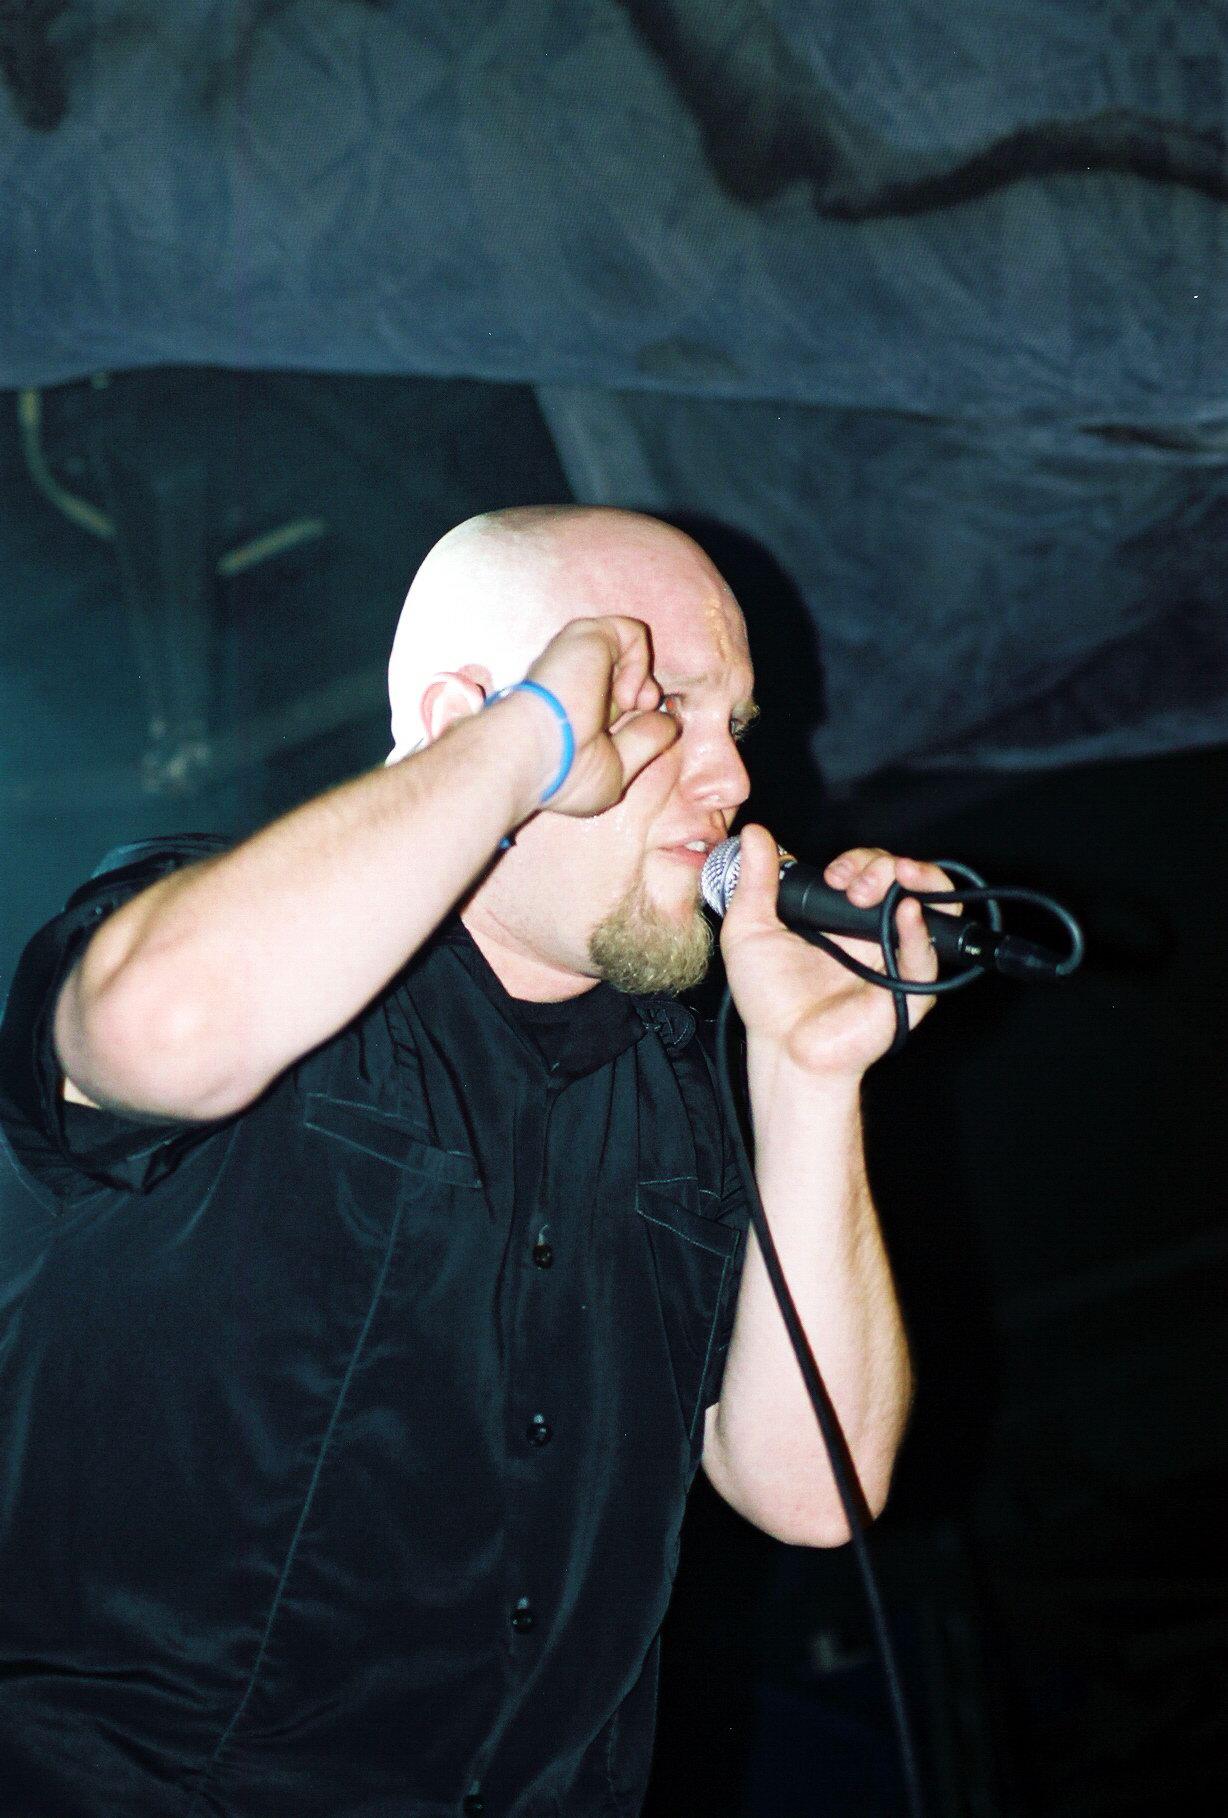 a~23 05-07-2005 08